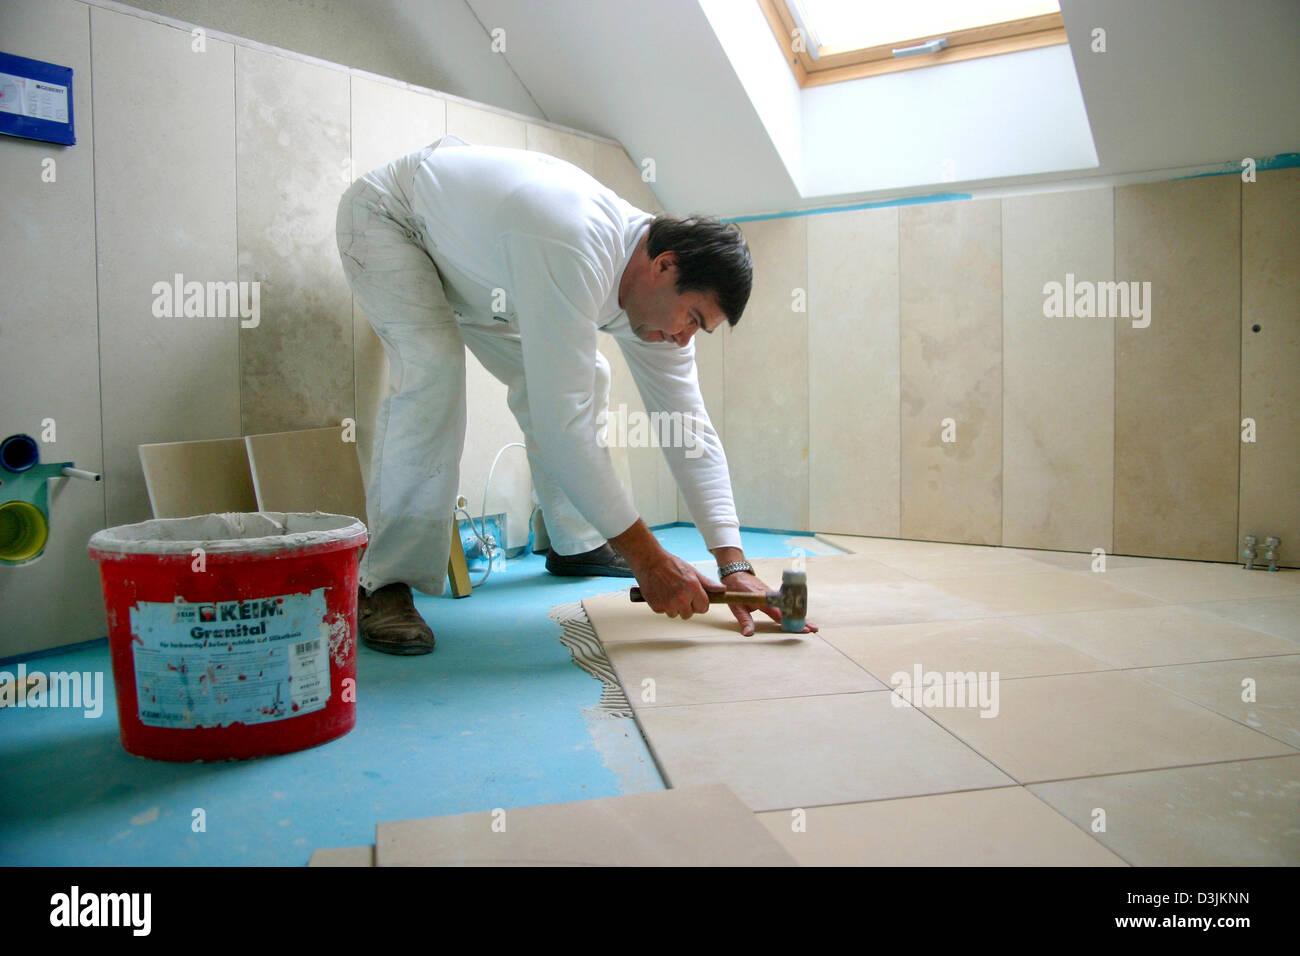 Dpa A Tiler Tiles A Bathroom At A Construction Site In Germany - Bathroom tiler